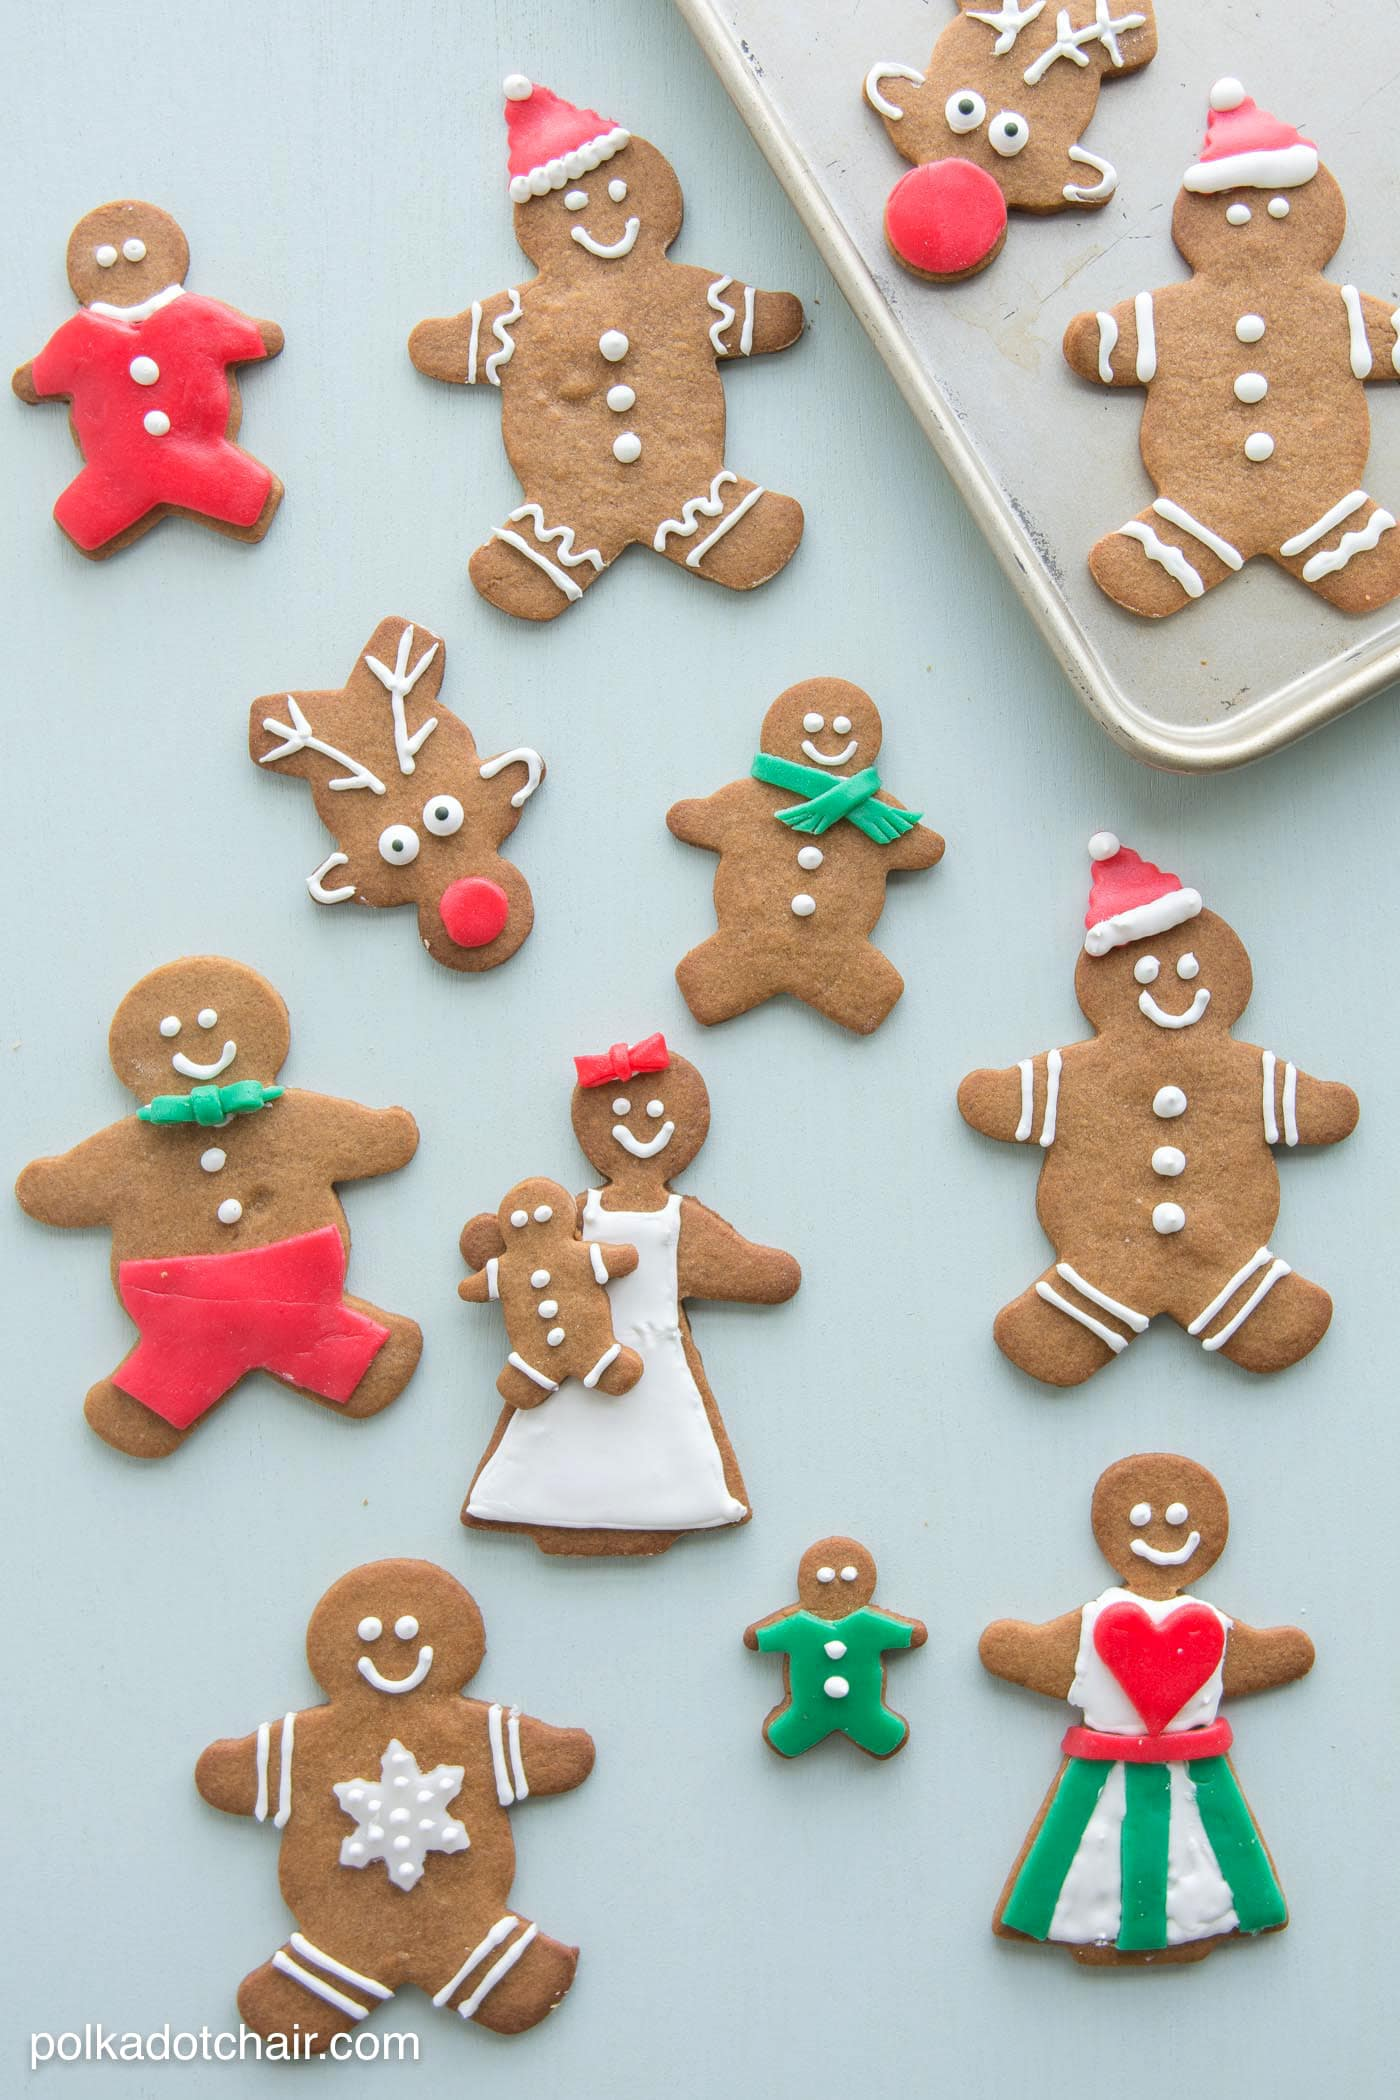 Enjoyable Gingerbread Cookie Decorating Ideas The Polka Dot Chair Easy Diy Christmas Decorations Tissureus